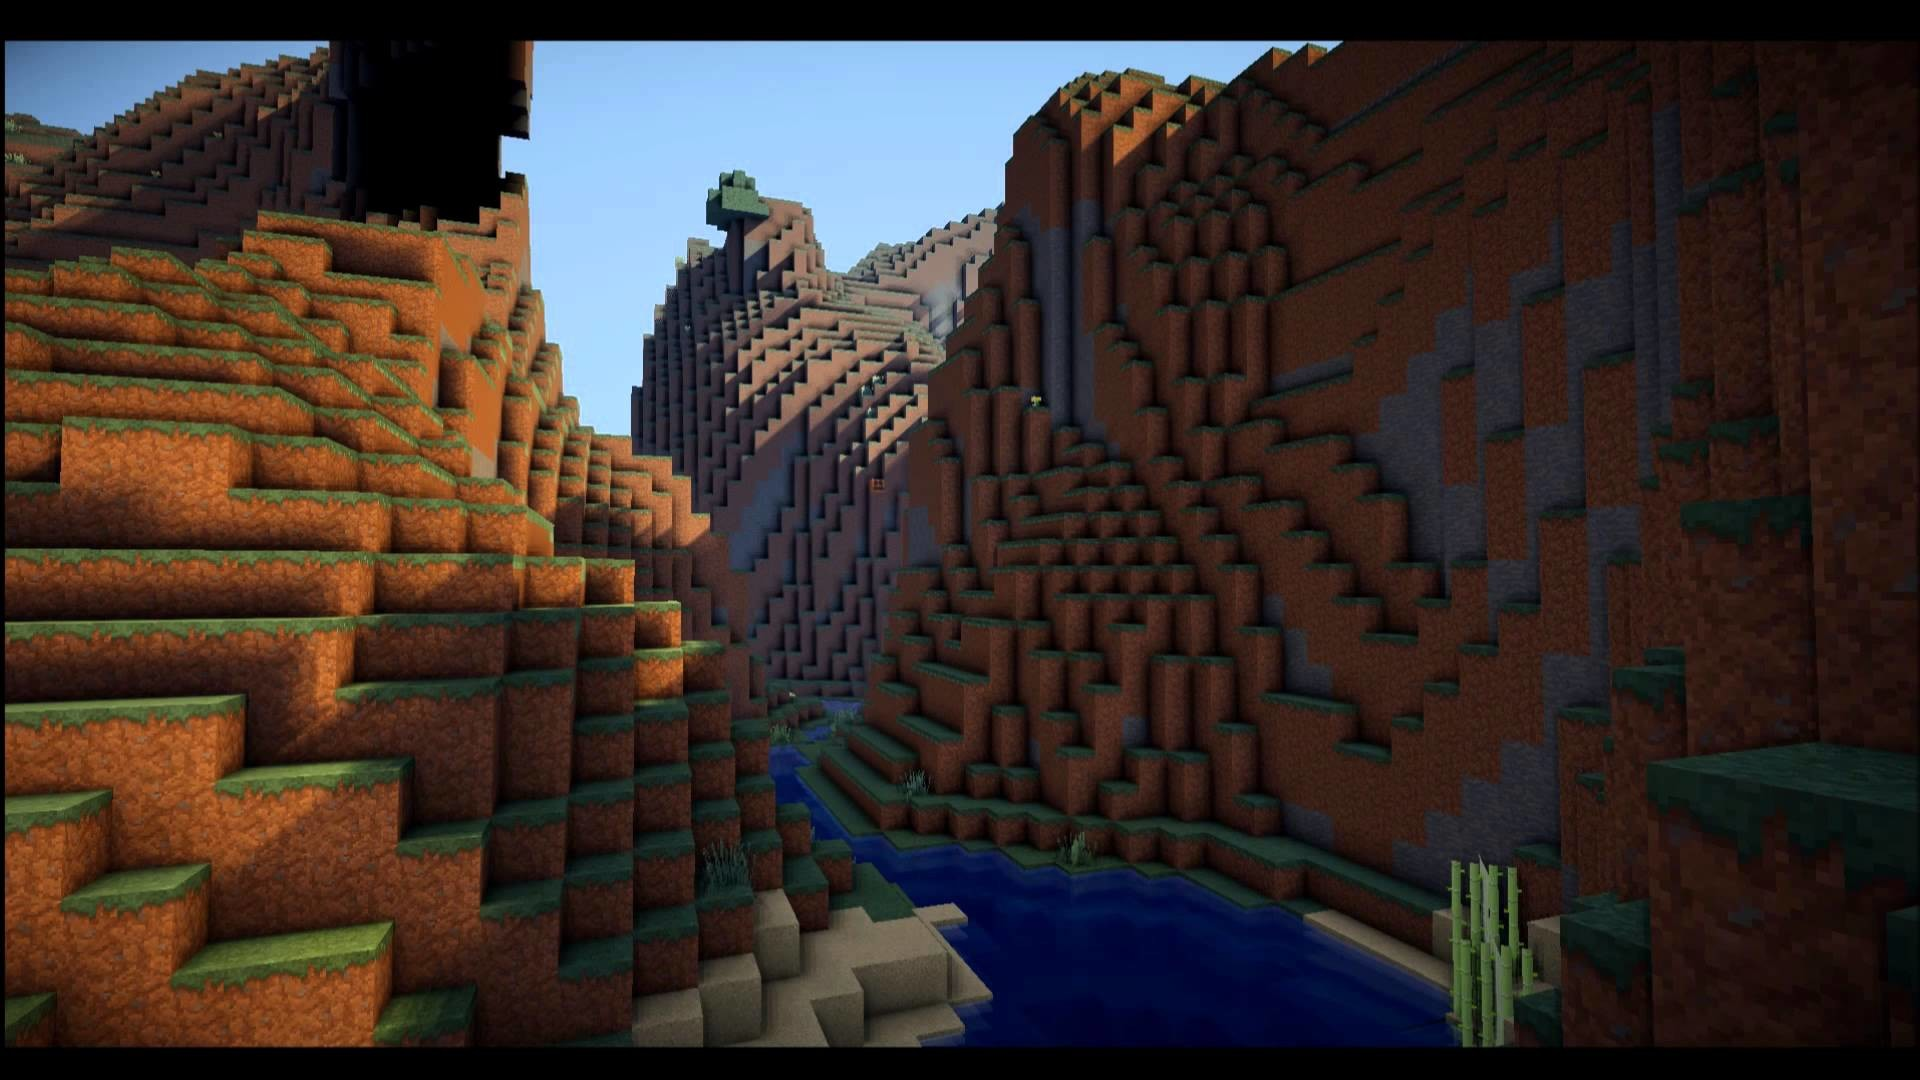 Best Wallpaper Minecraft Real Life - 795051-free-minecraft-background-wallpaper-1920x1080  Image_321034.jpg